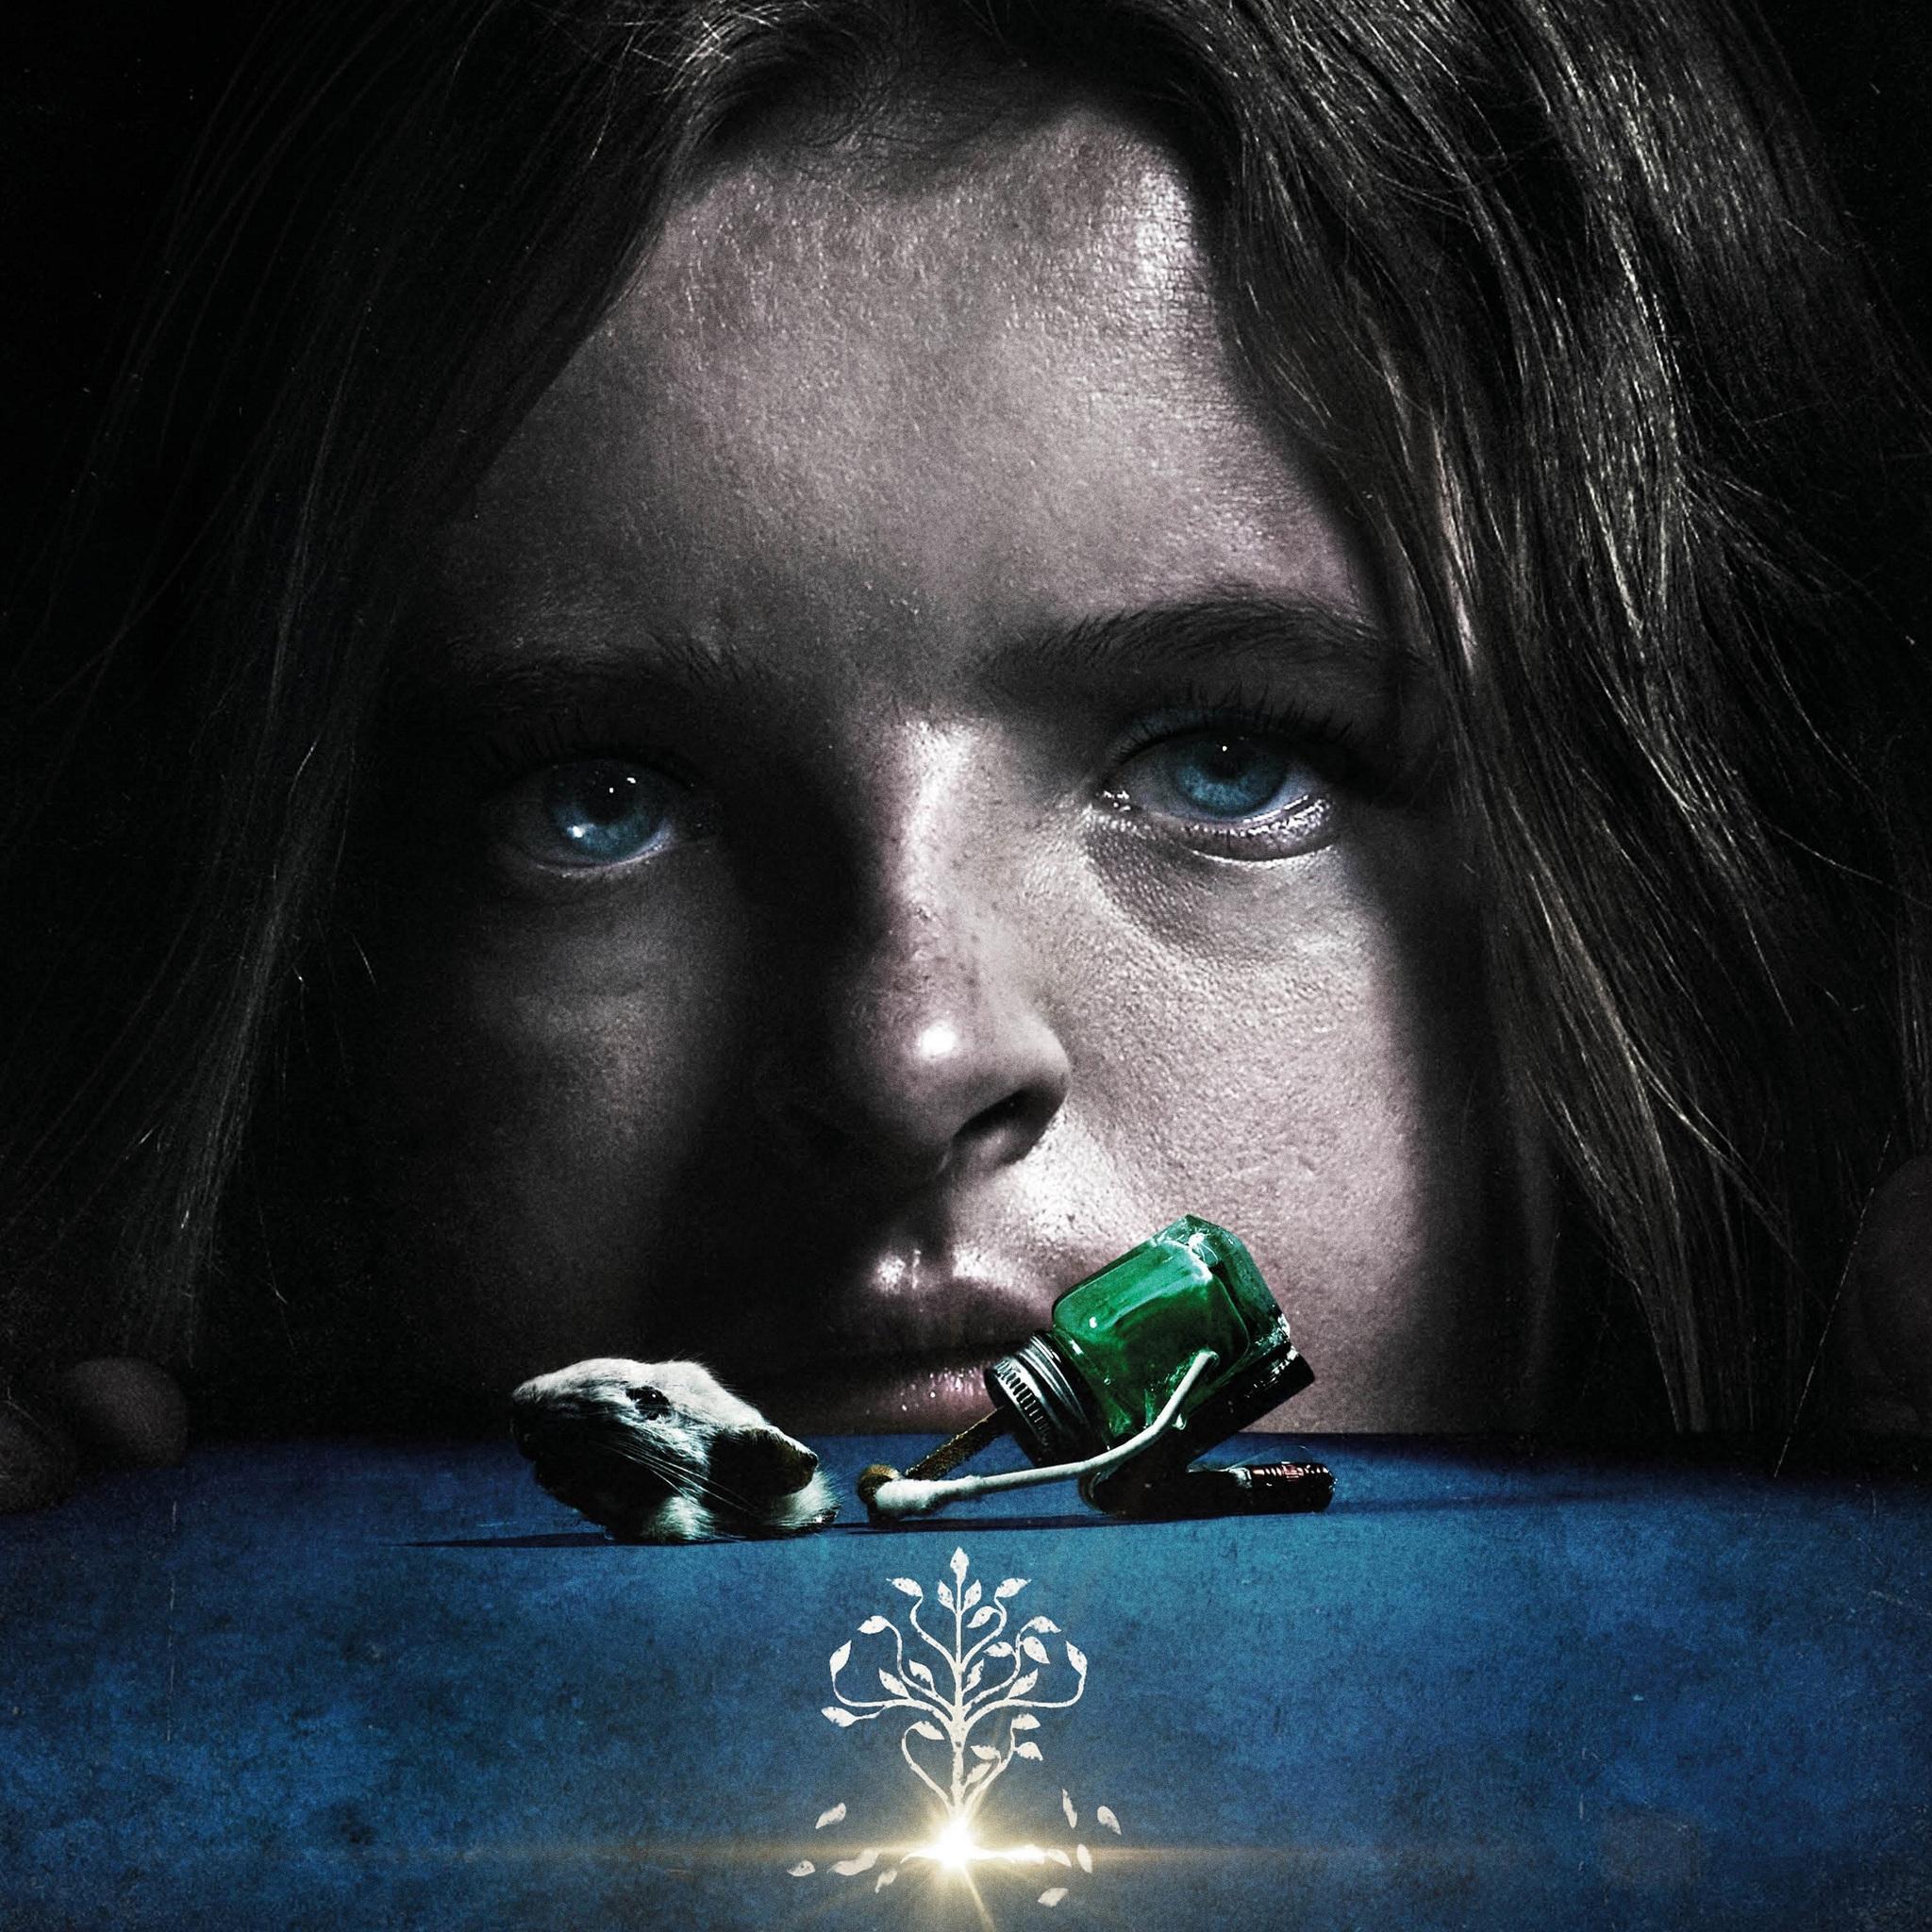 hereditary-2018-movie-4k-e3.jpg